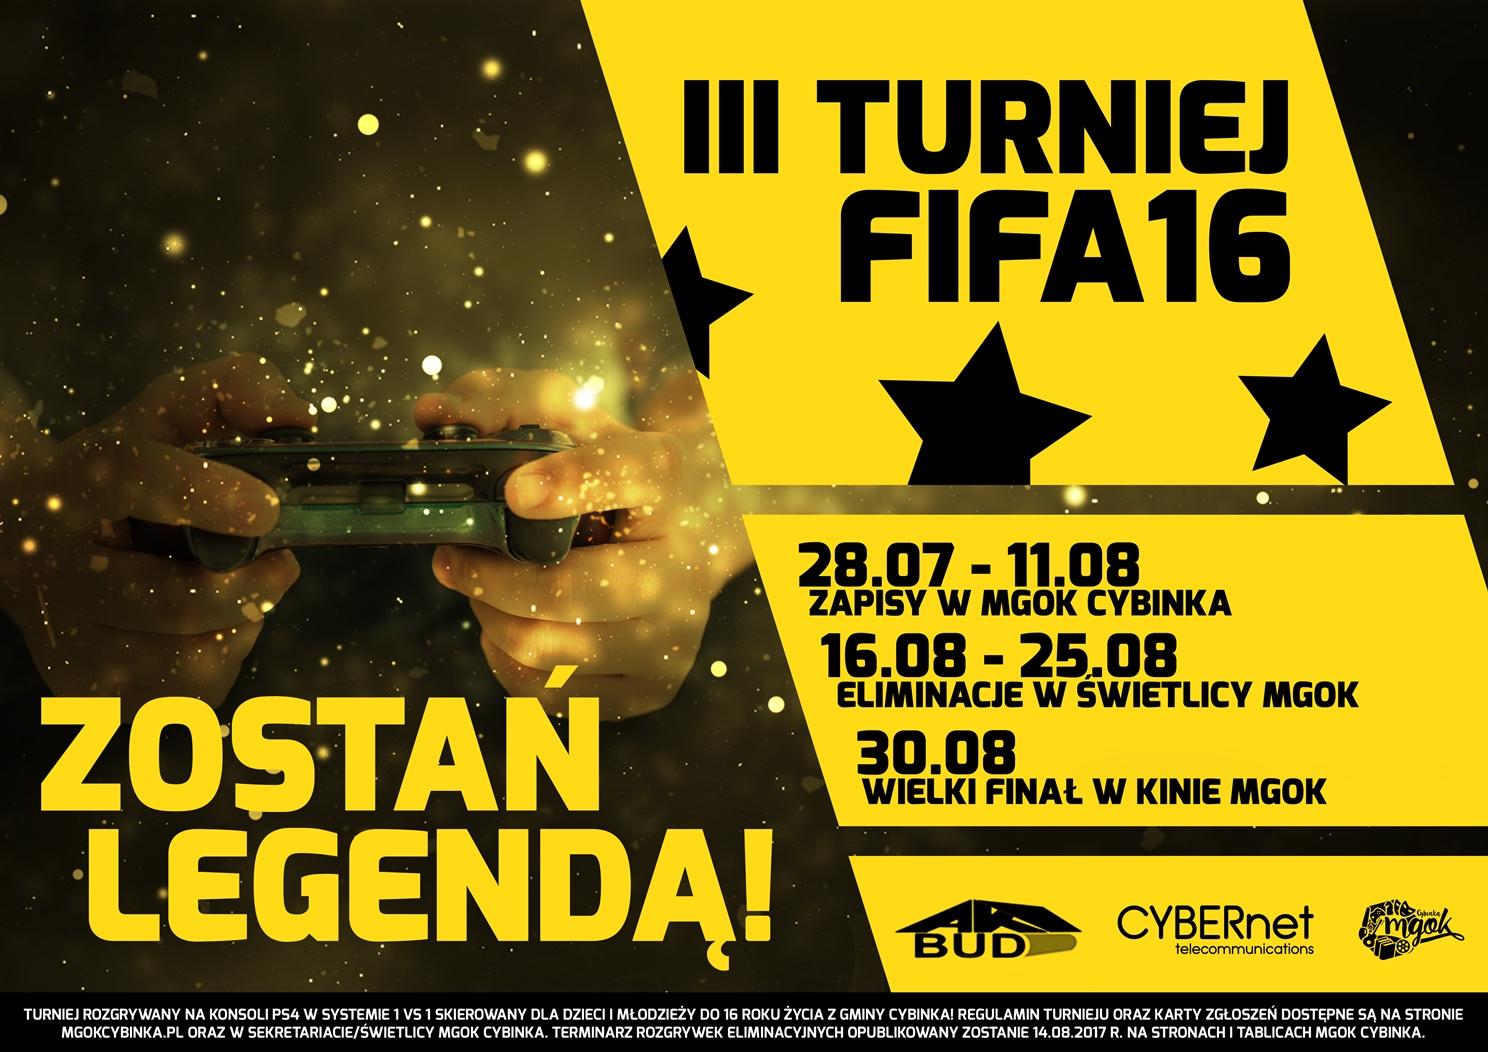 III Turnieju FIFA